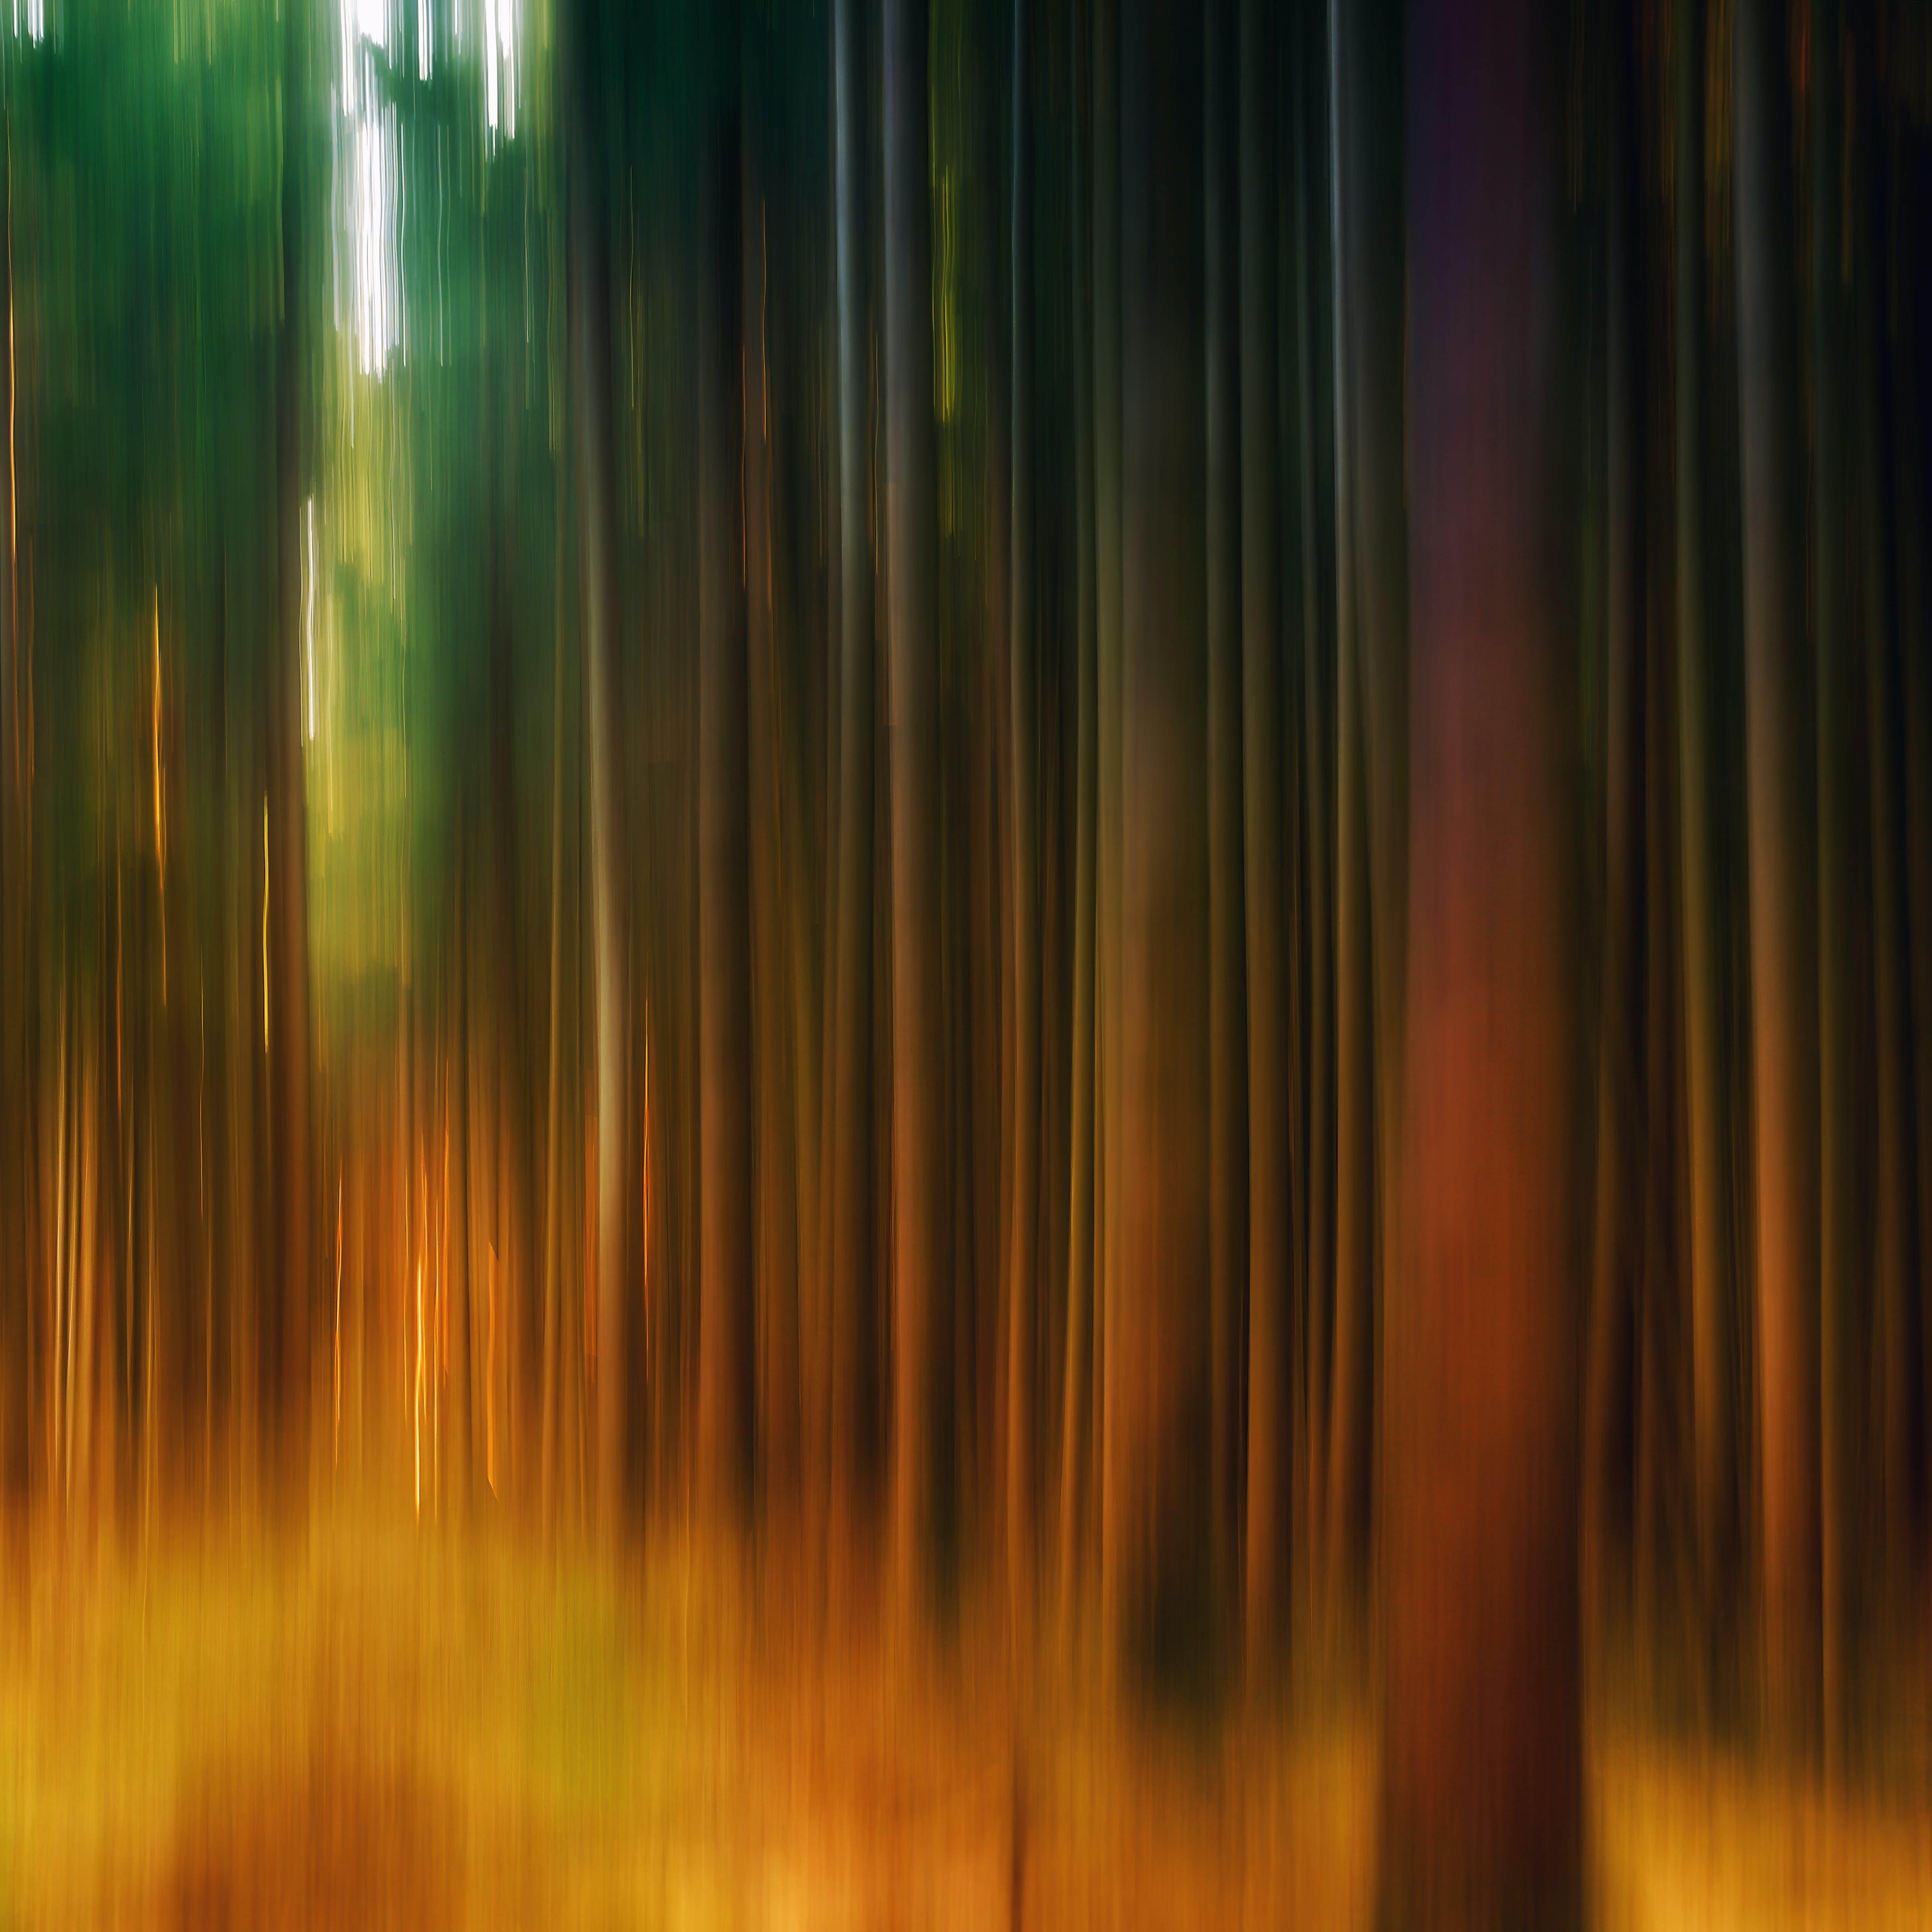 Gratis arkivbilde med design, farger, fargerik, fokus